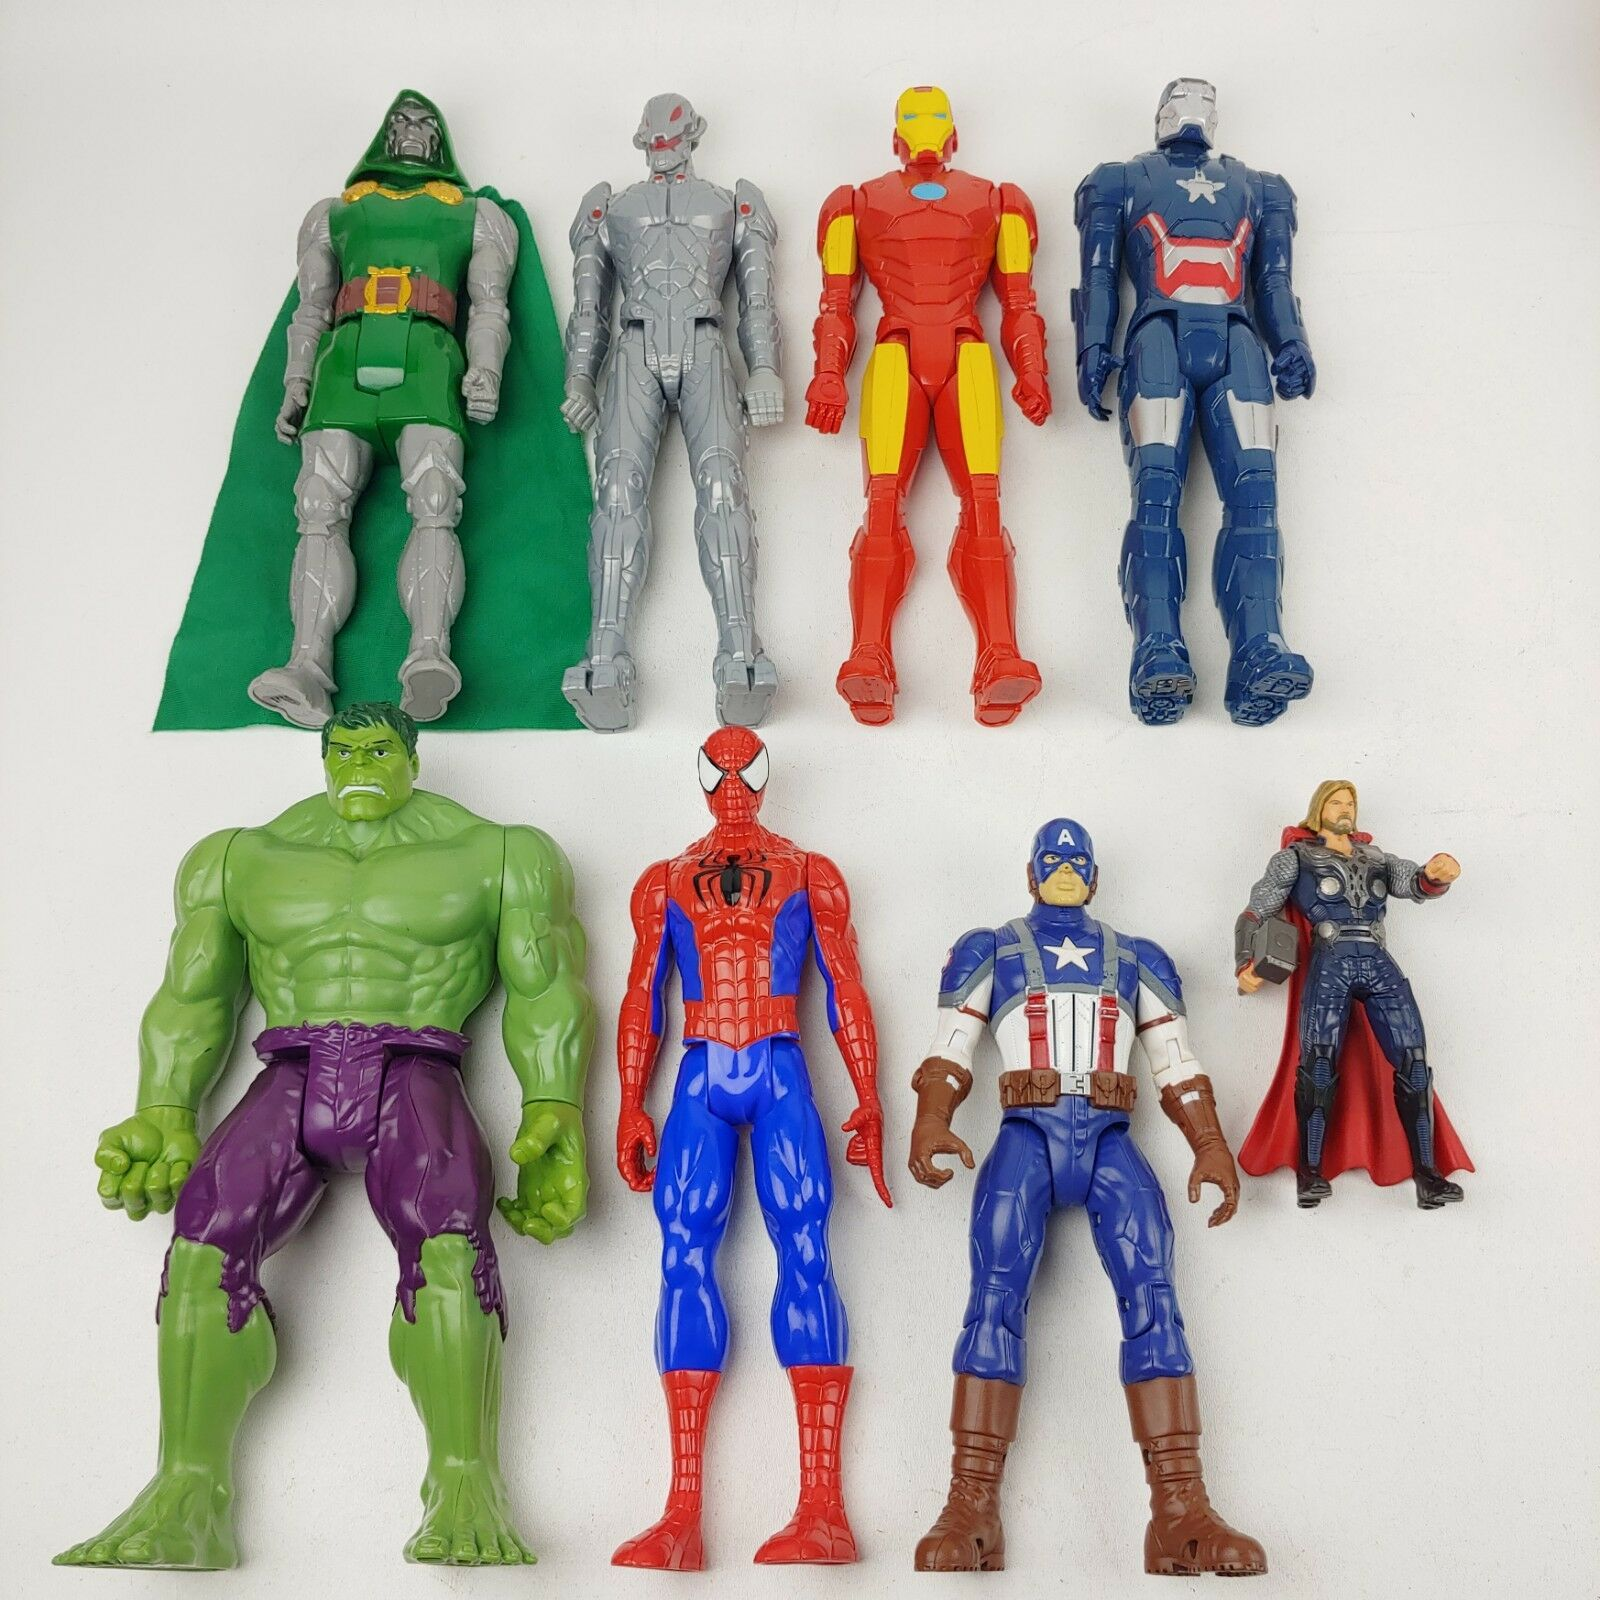 Marvel Avengers Spider-Man HULK Titan Hero Series 12